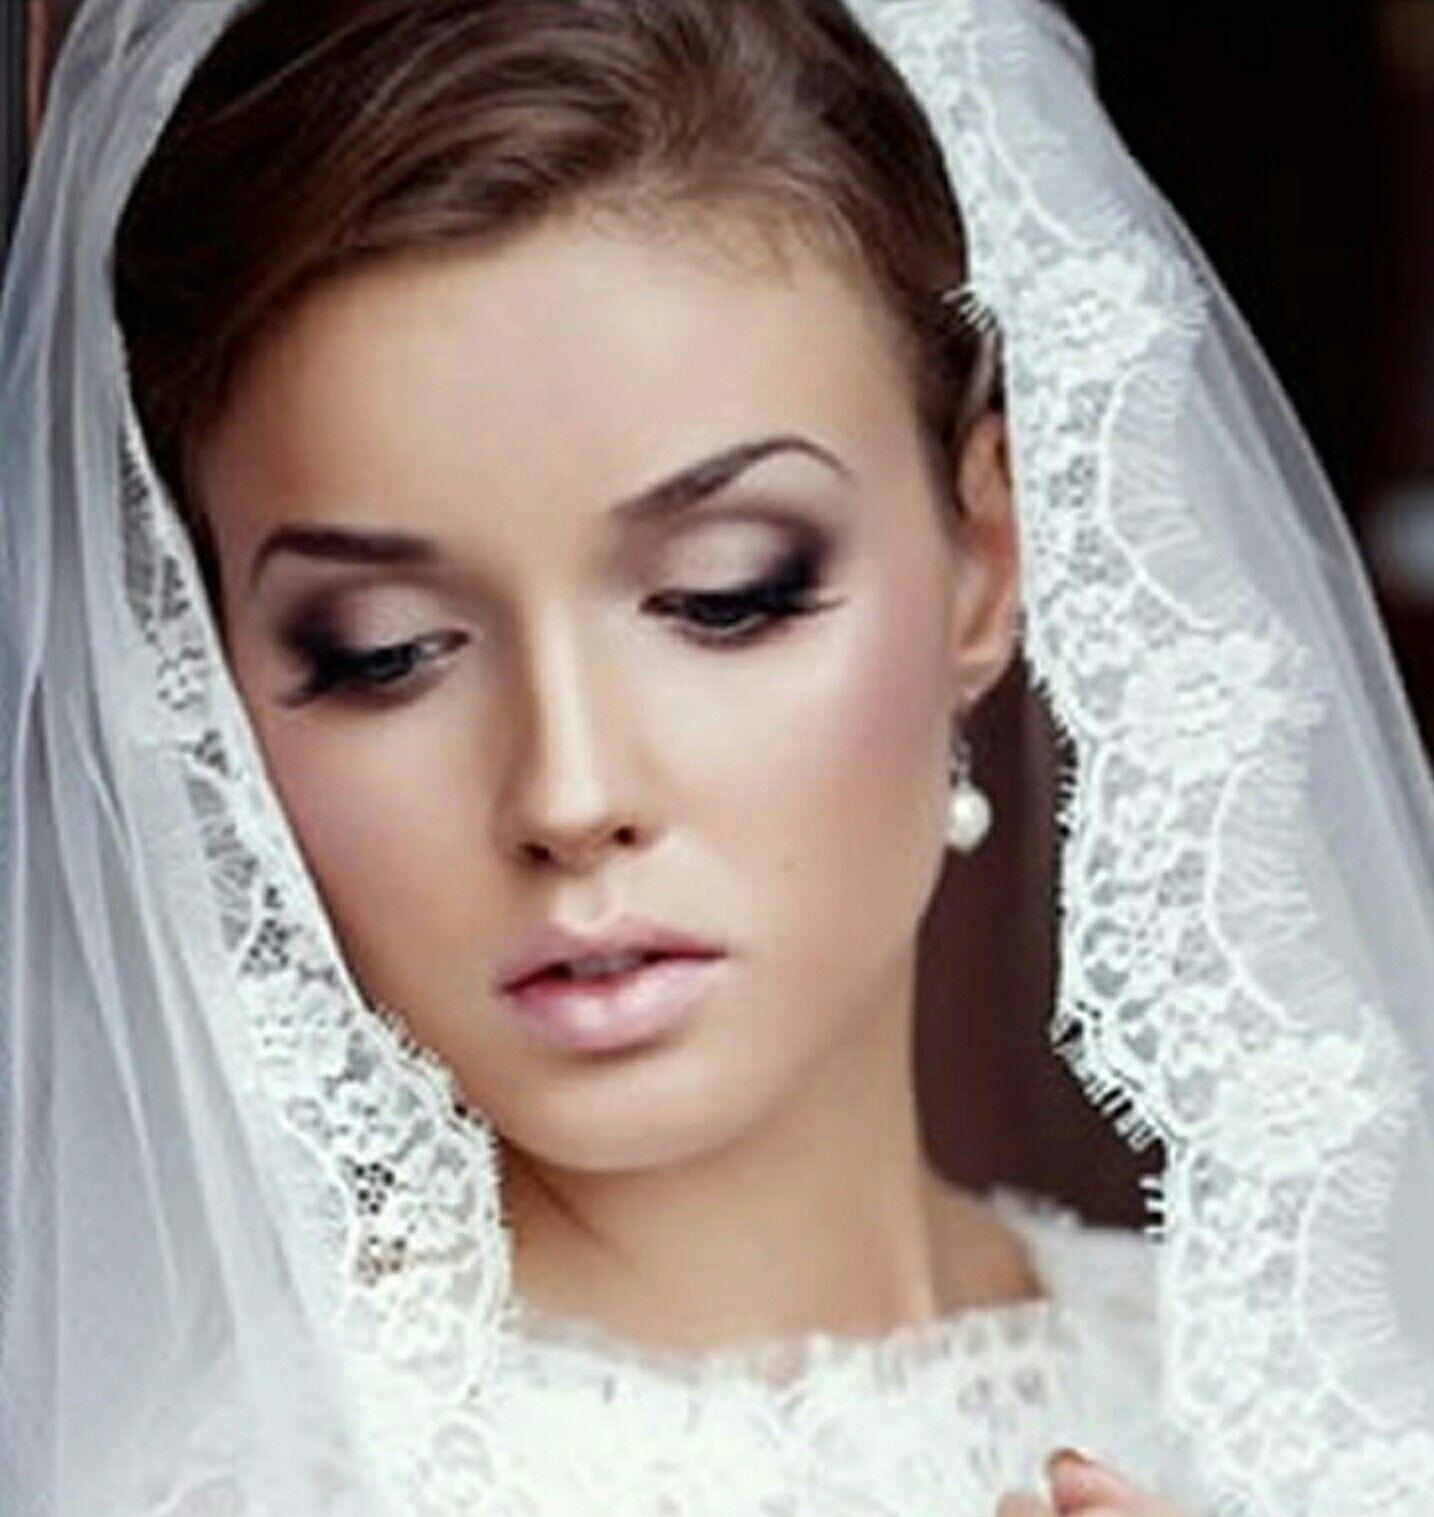 Pin de Amynadab PG en WEDDING Makeup